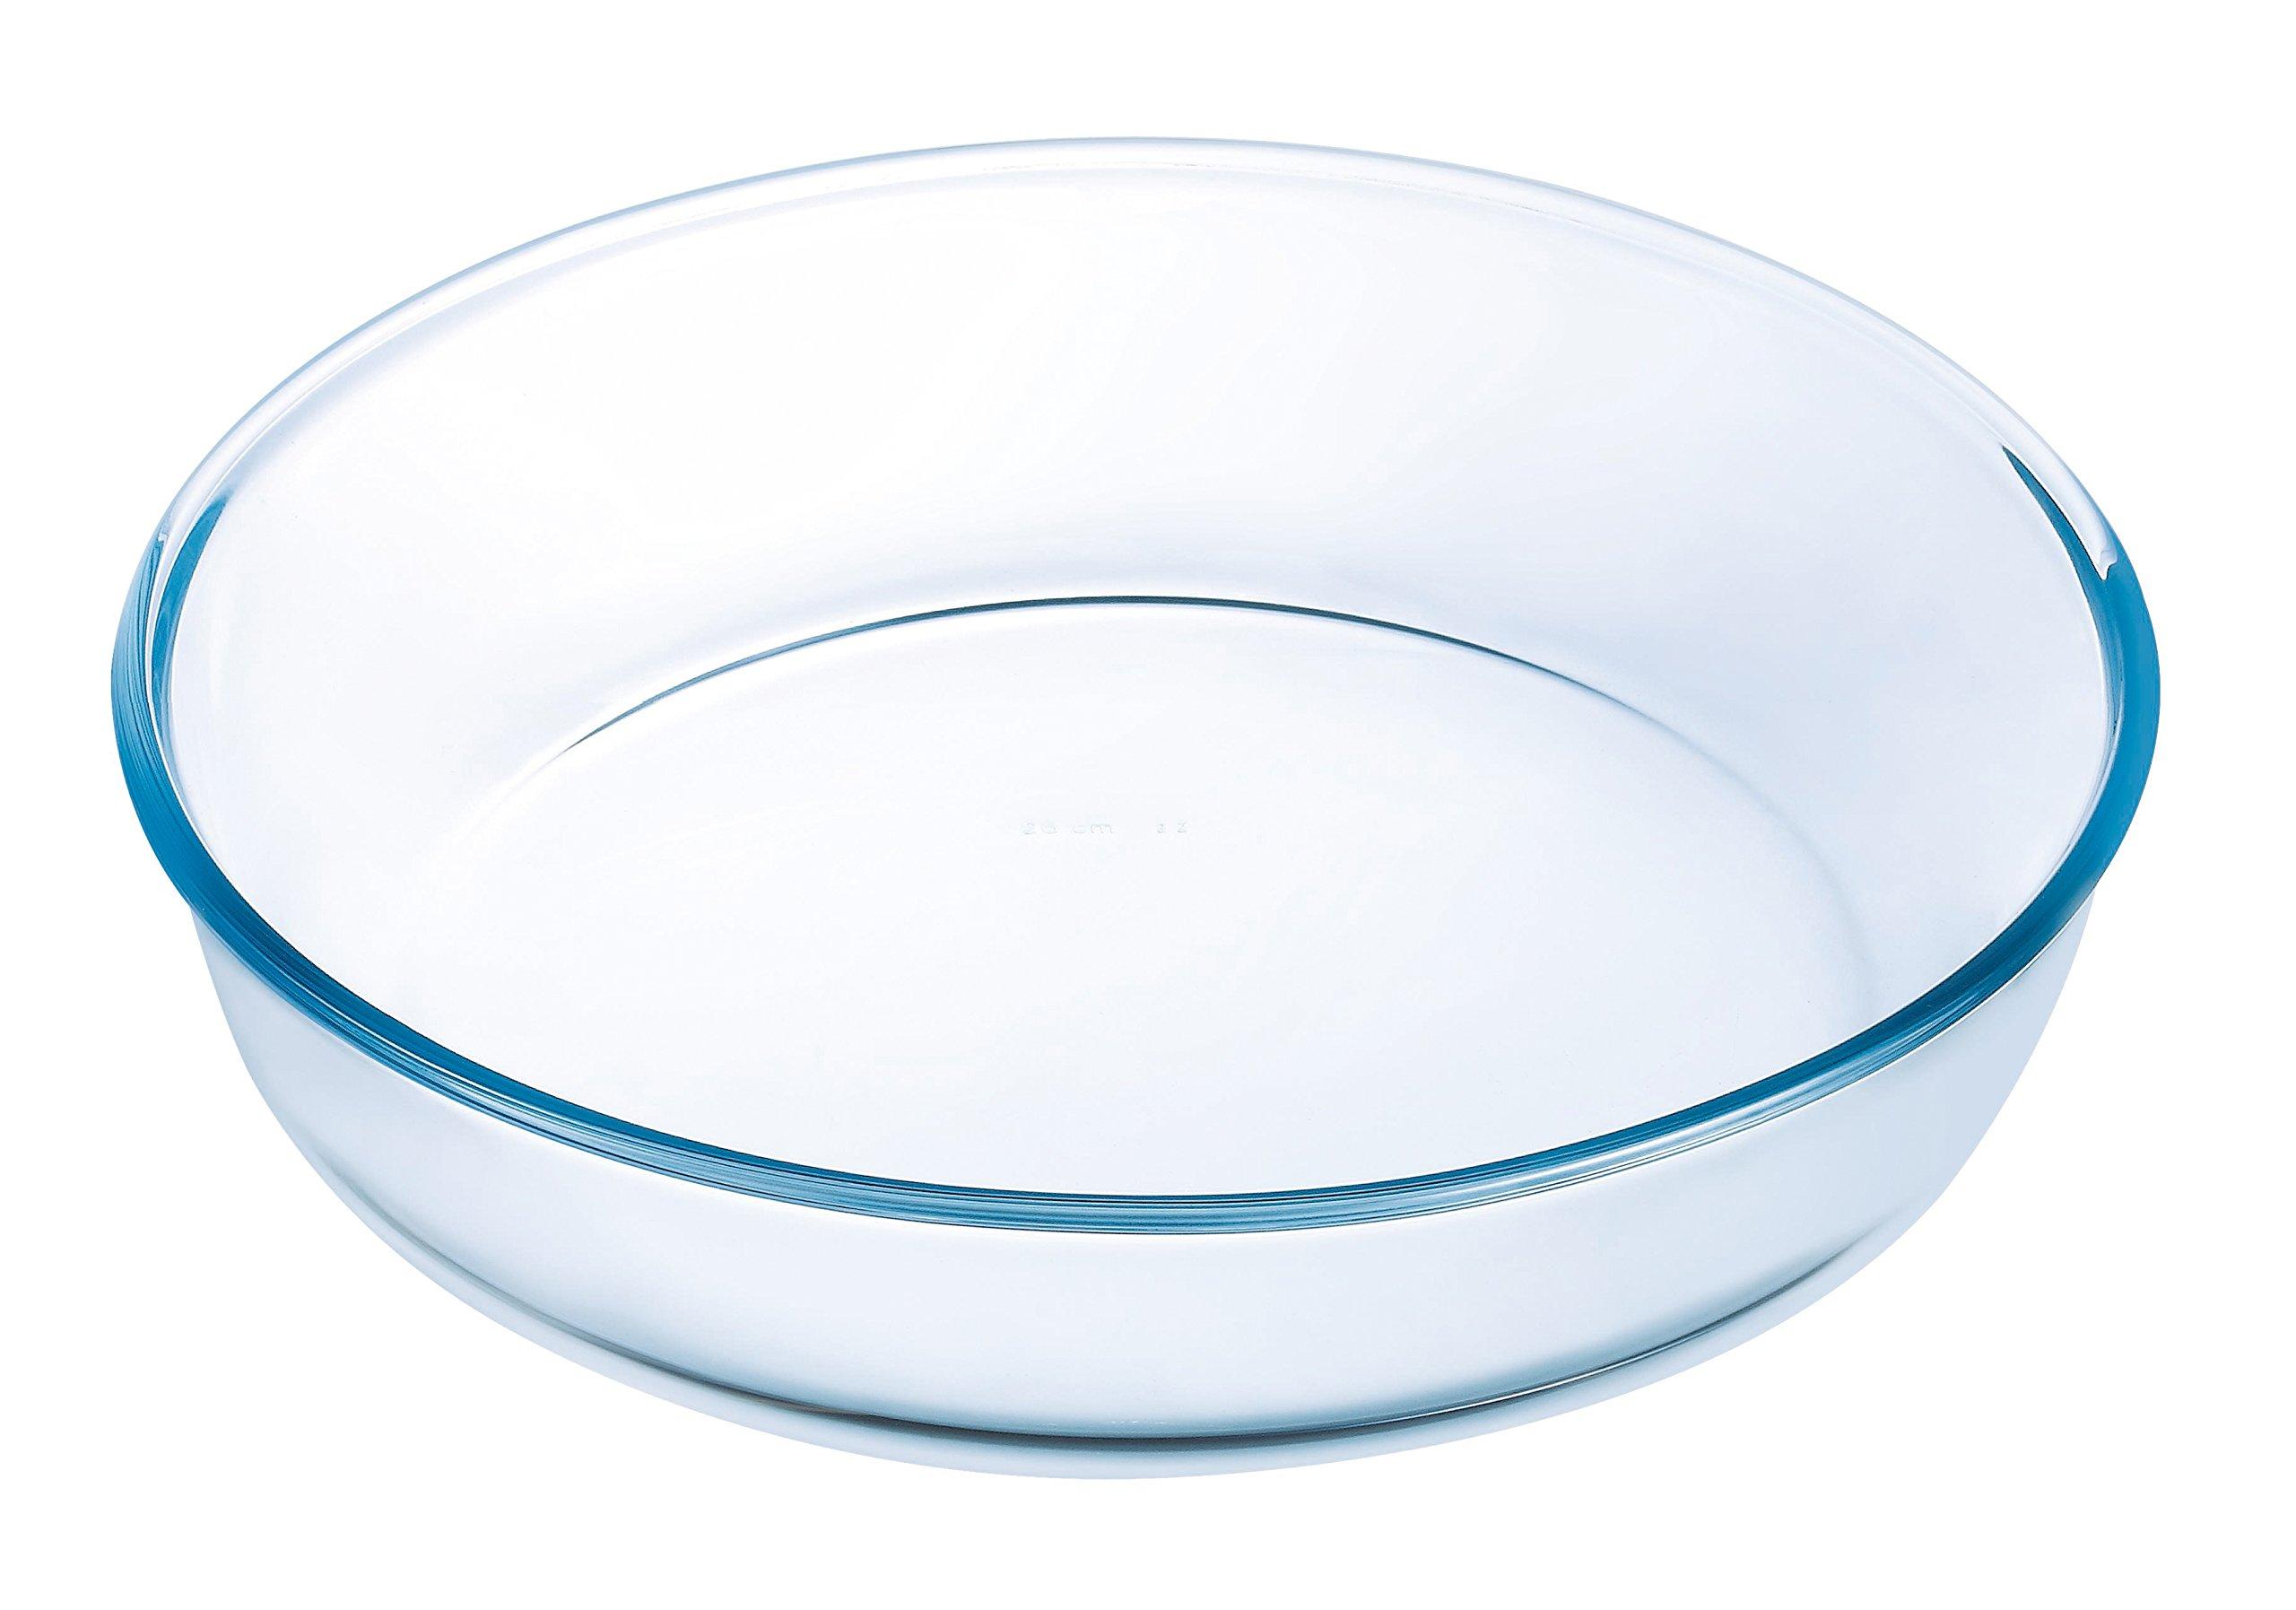 Ô cuisine - Molde Tarta, Hondo, Gris, 26 cm product image